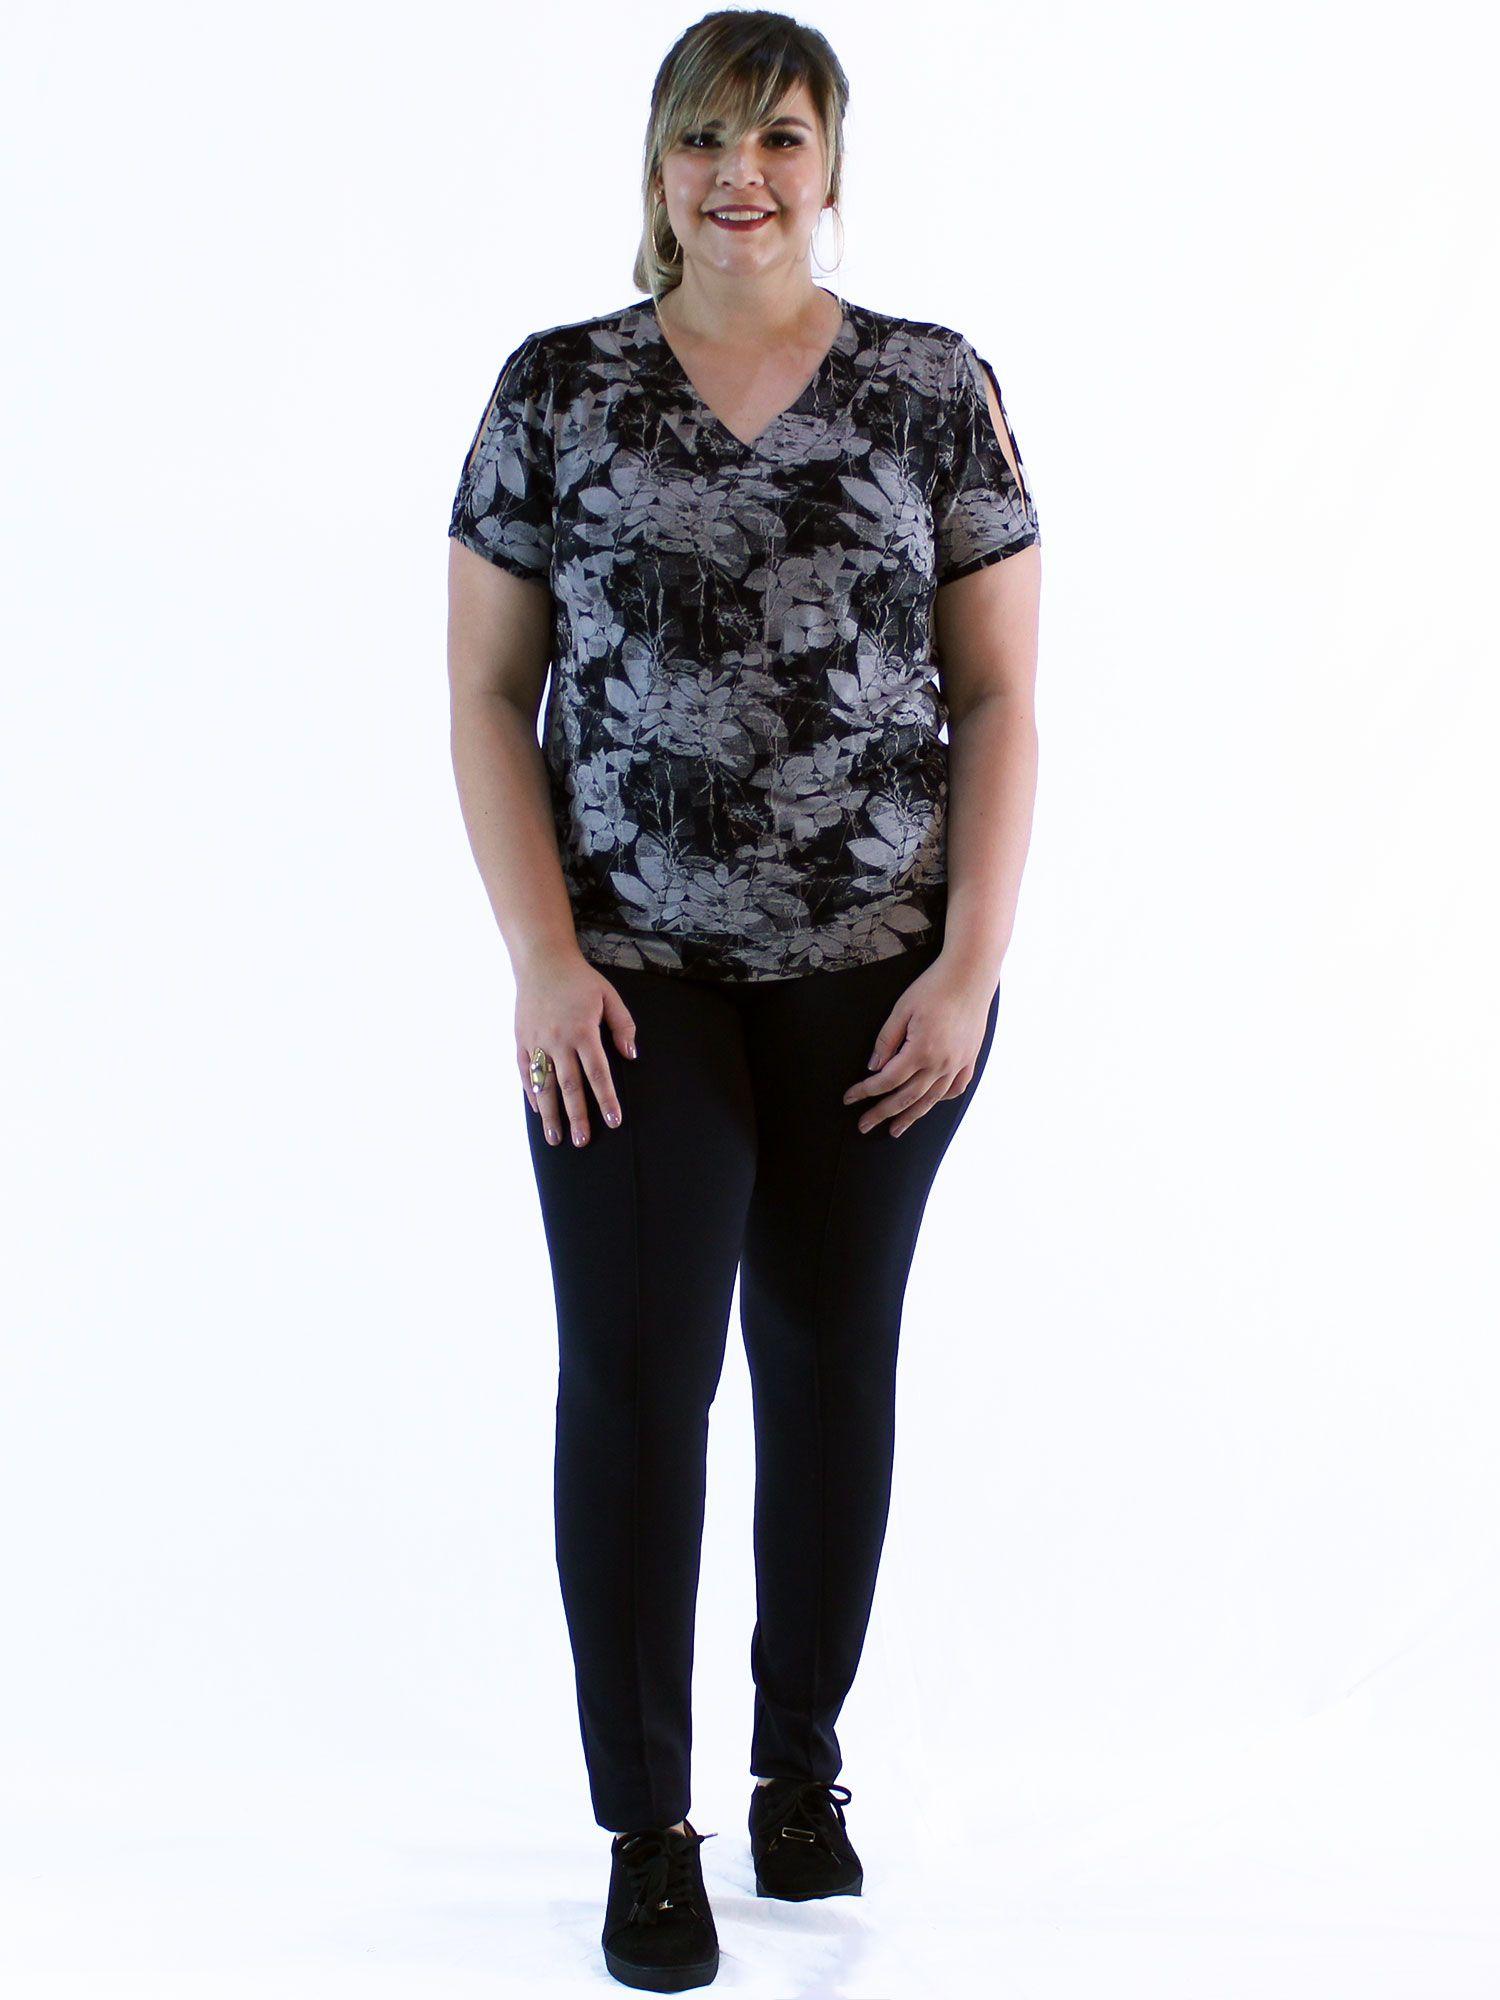 Blusa Plus Size KTS Estampada Decote Diferenciada Preto